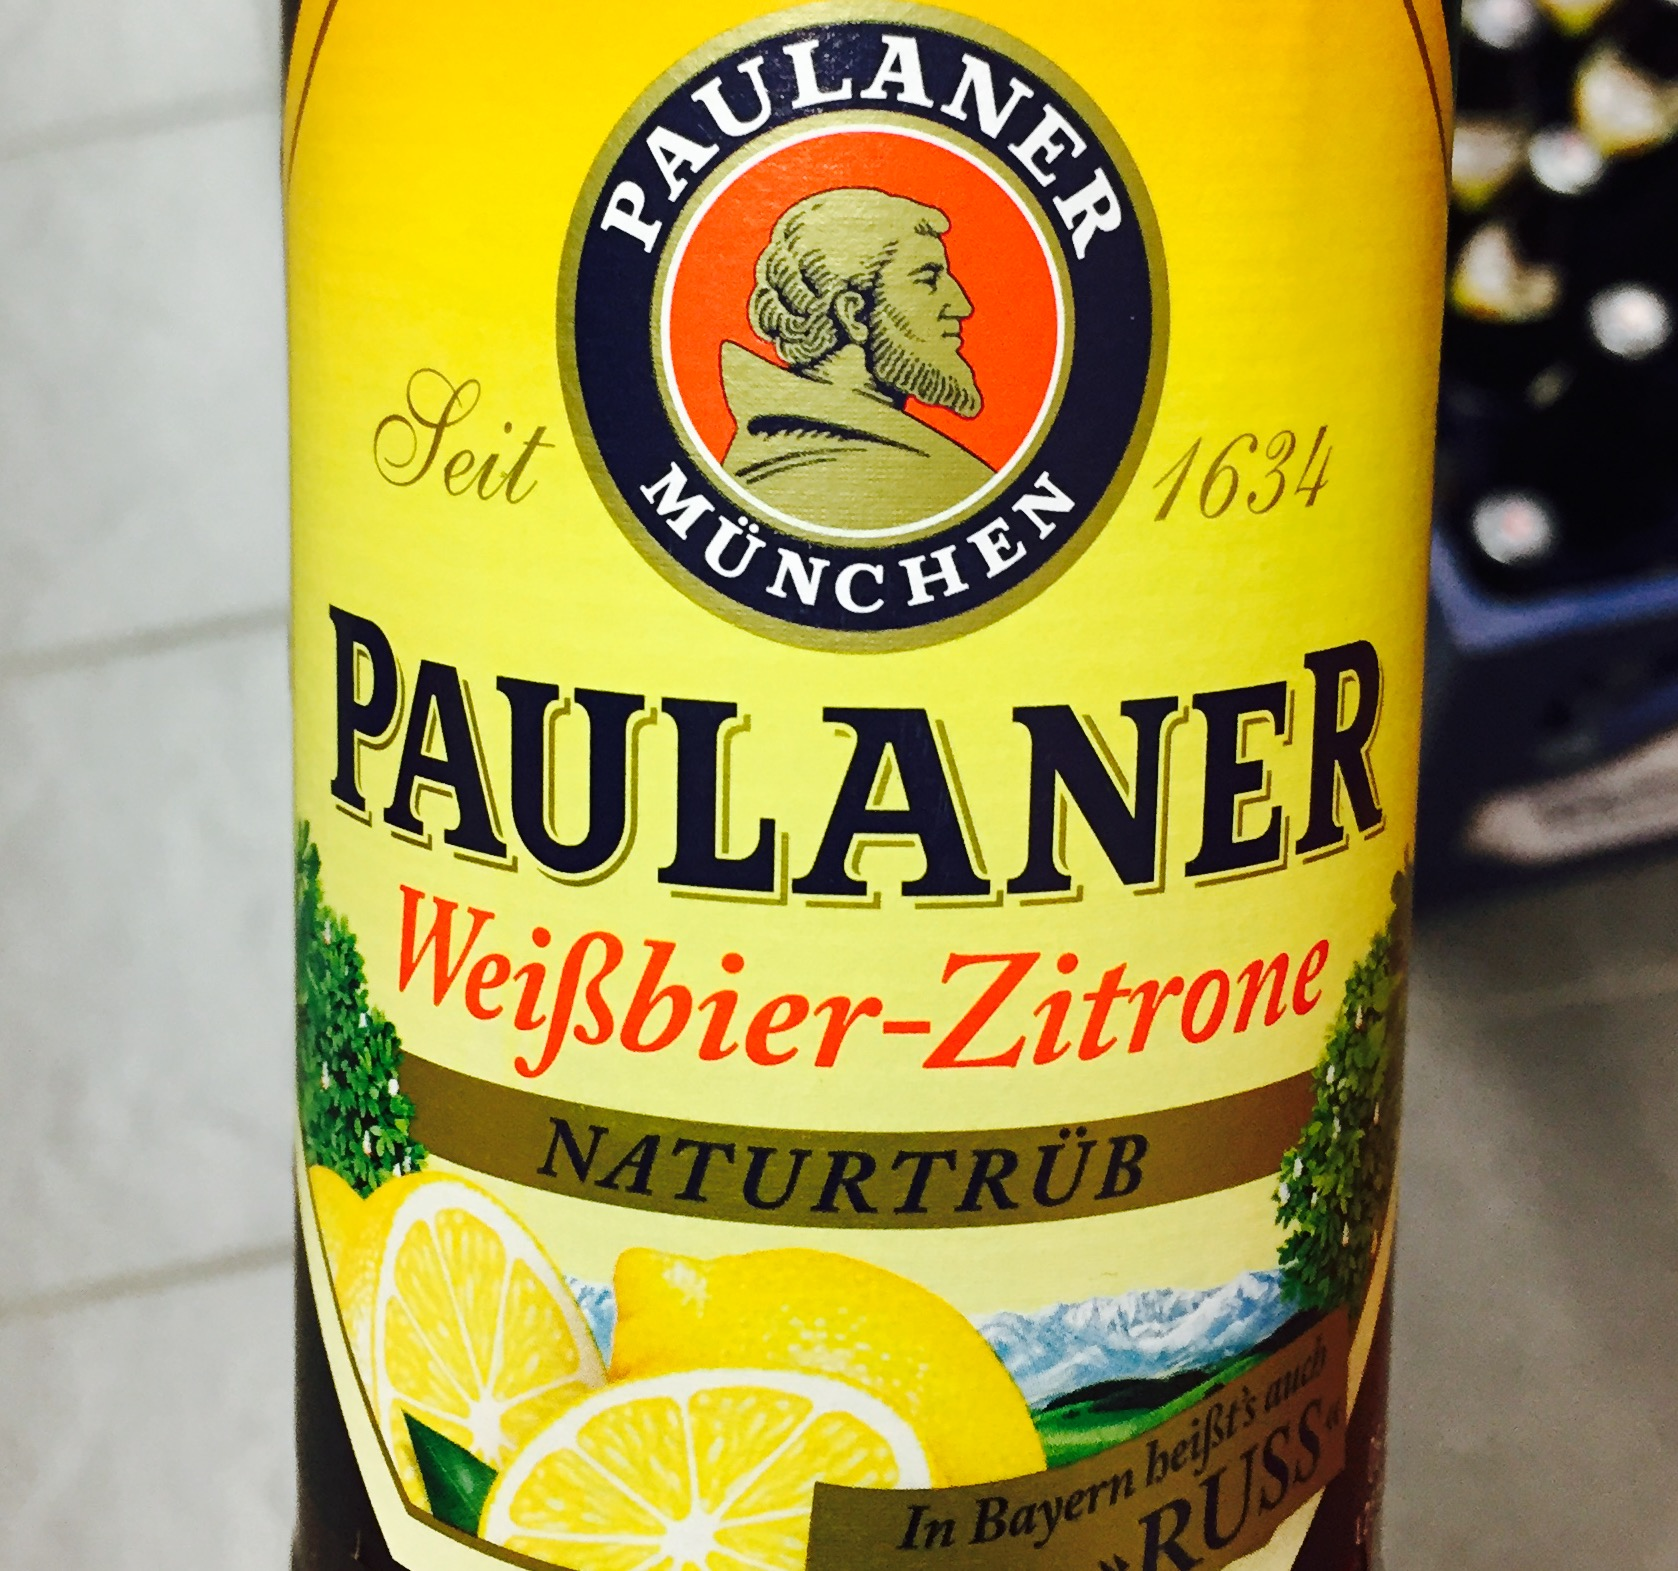 Paulaner - Weißbier Zitrone, Beer, Tasting, Rating, Bier, Verkostung, Radler, Bewertung, Alle Biere der Welt, hier bei BeerToGo